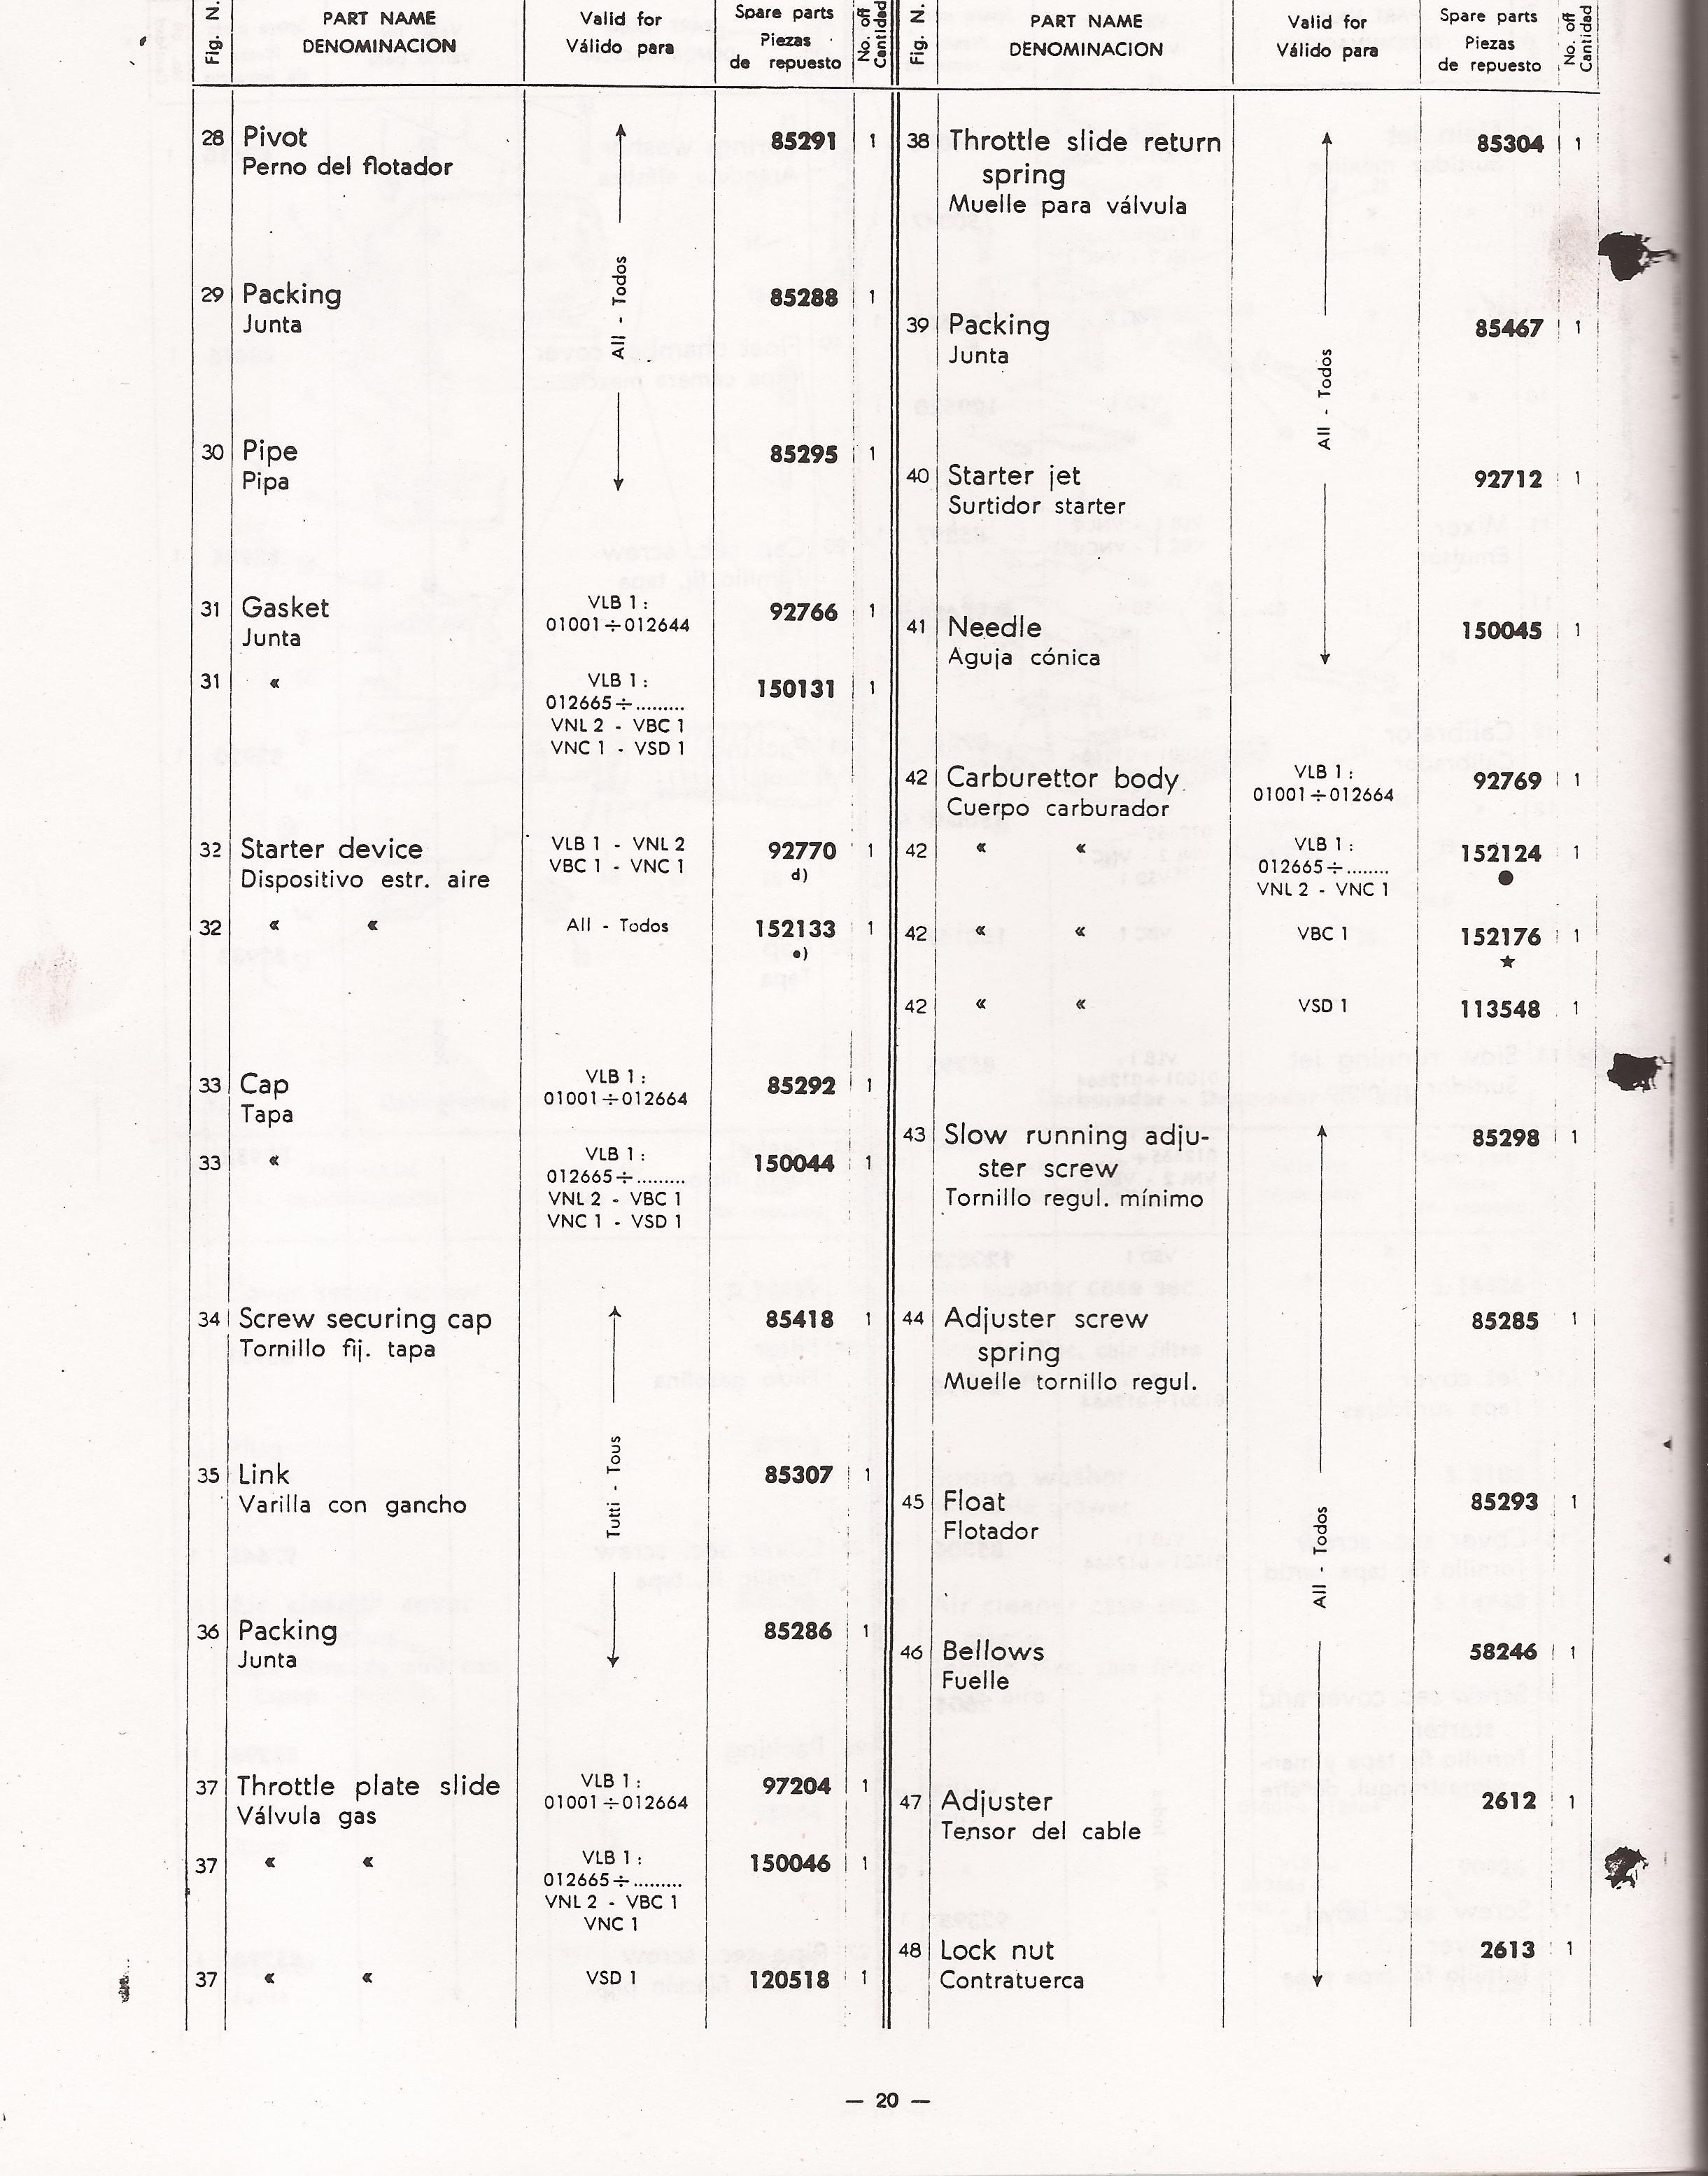 02-25-2013 vespa manaul 21.jpg